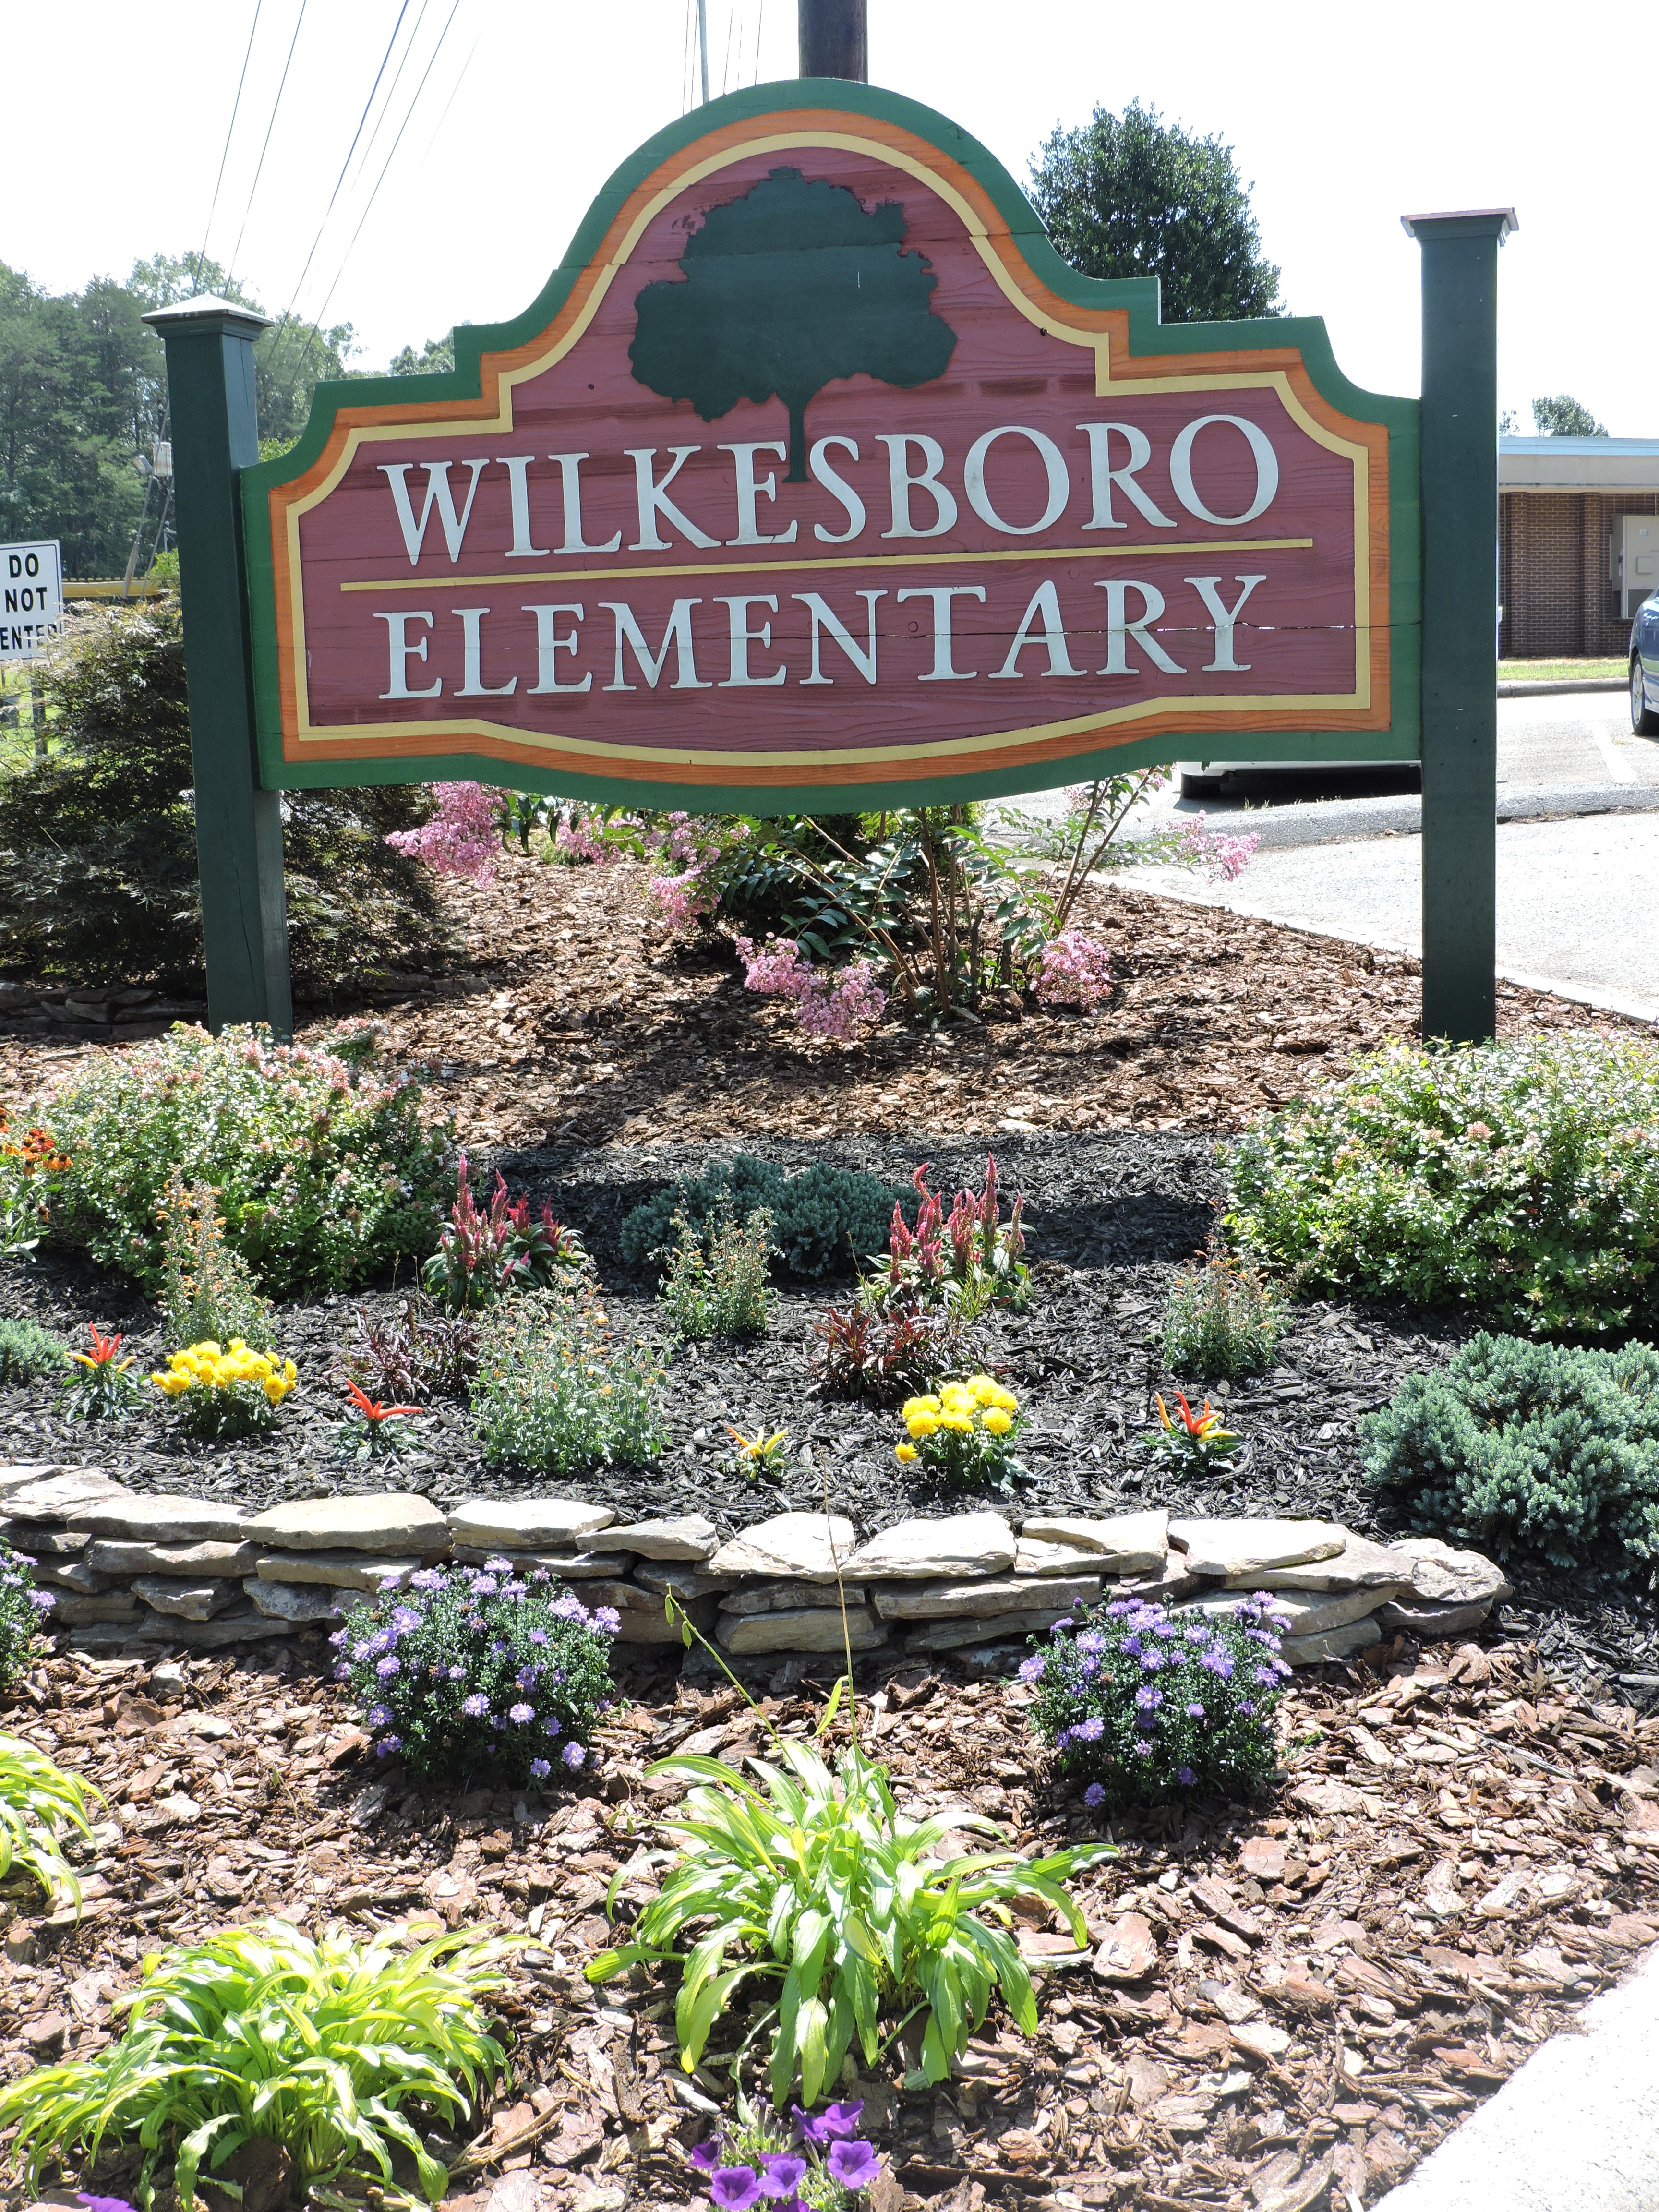 Welcome to Wilkesboro Elementary School Image